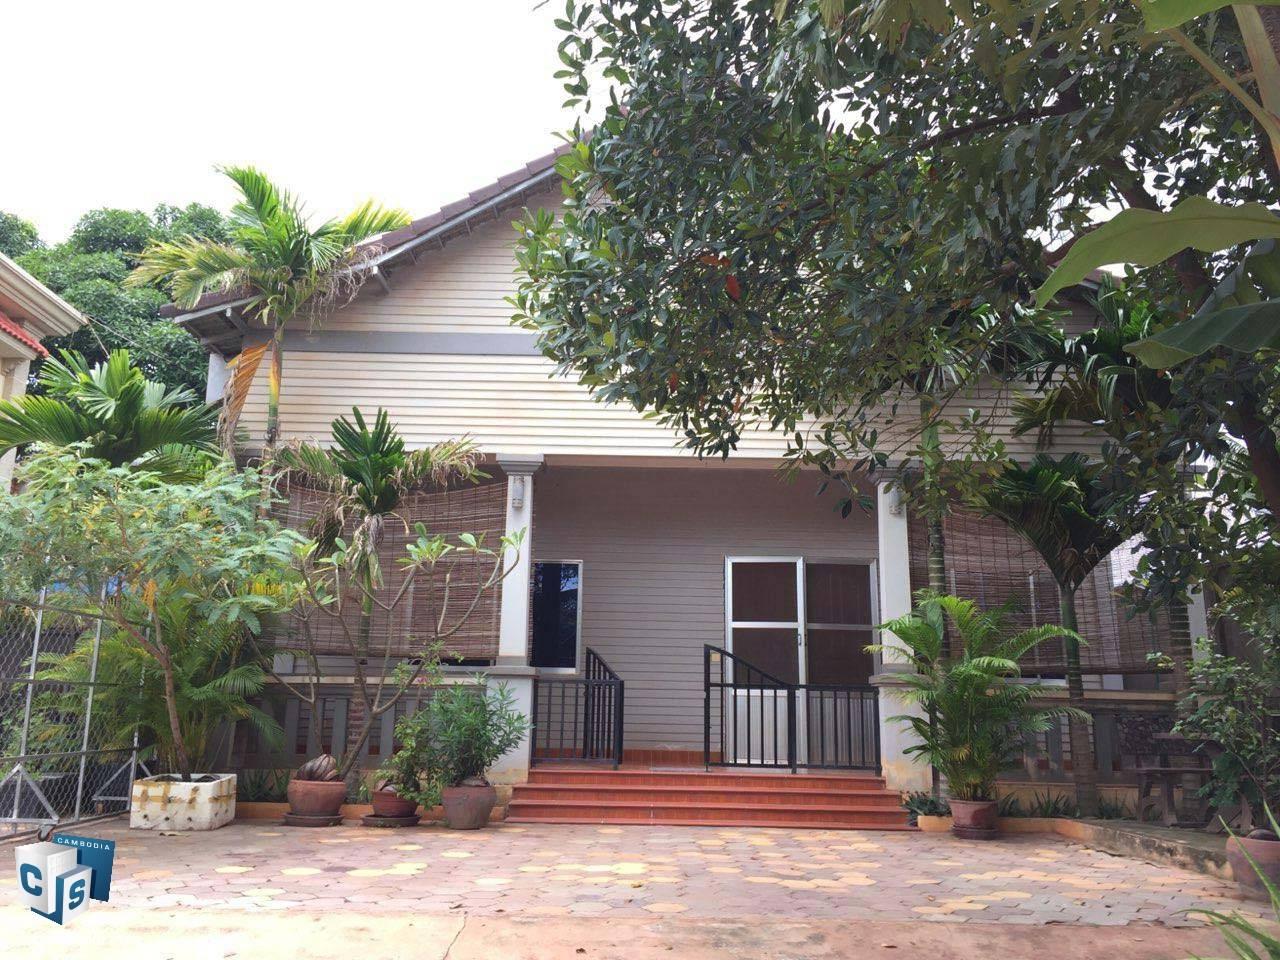 2 Bedroom House – For Rent – Sla Kram Commune – Siem Reap